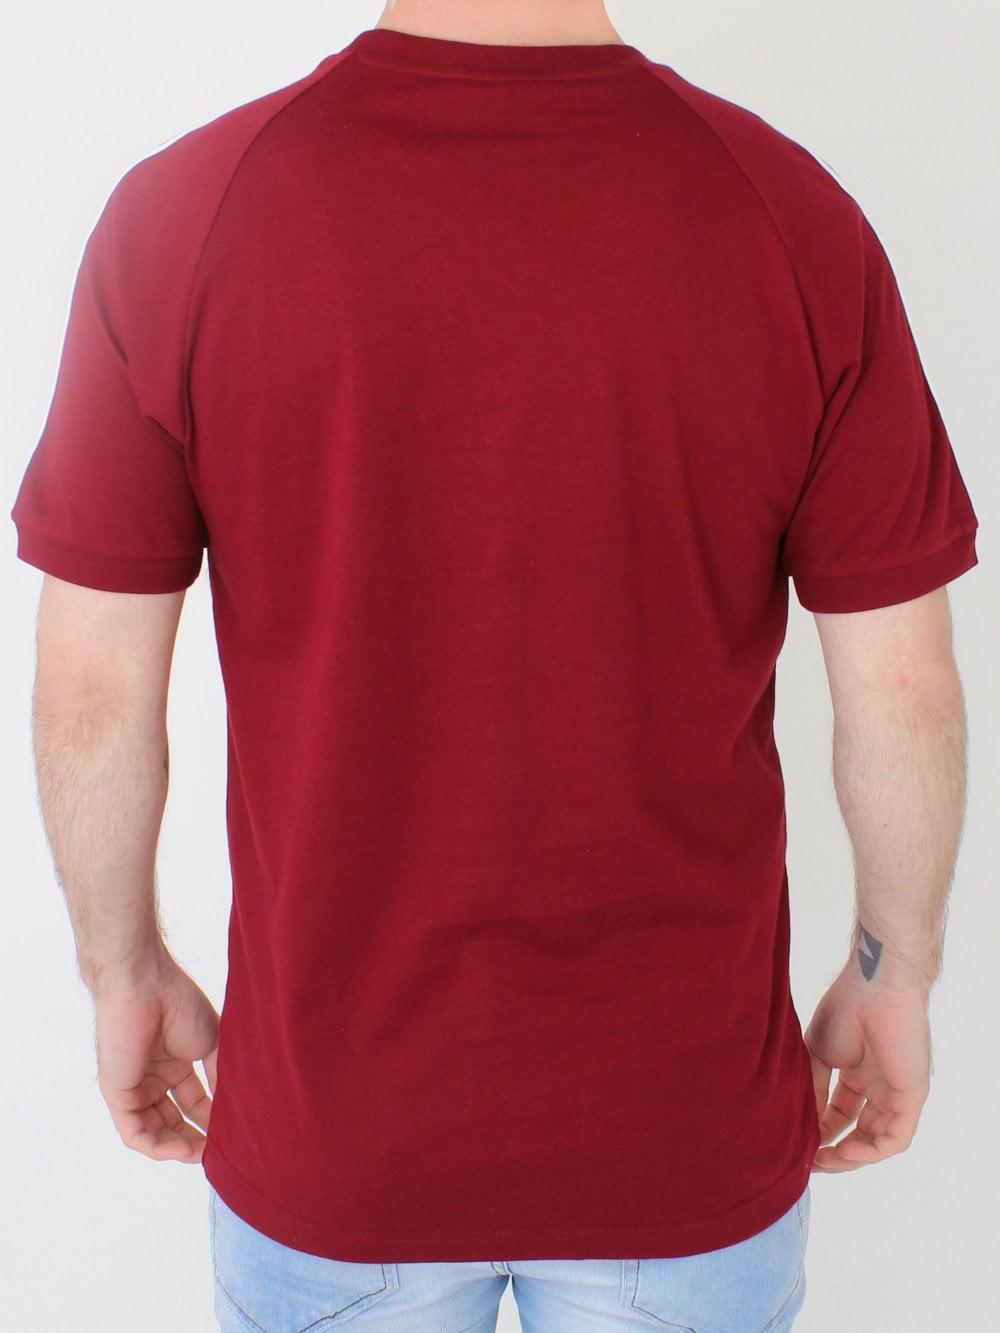 77452fdc71 Adidas 3 Stripes T.Shirt in Burgundy | Northern Threads